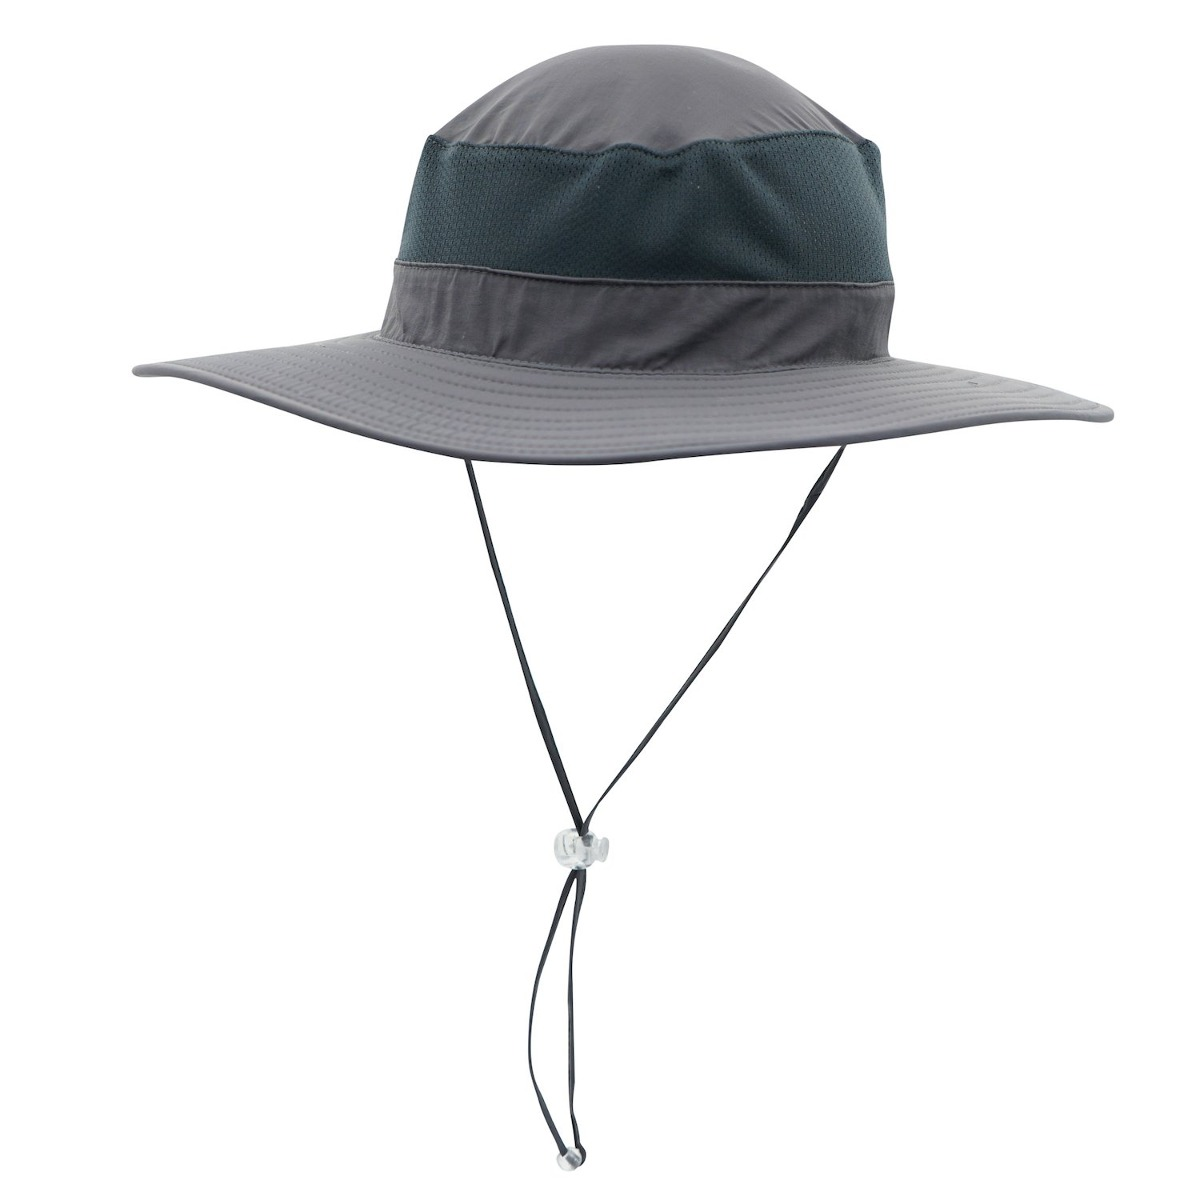 Home Prefer Sombrero De Sol Para Hombre Sombrero De Malla So ... 79db2cf857b5